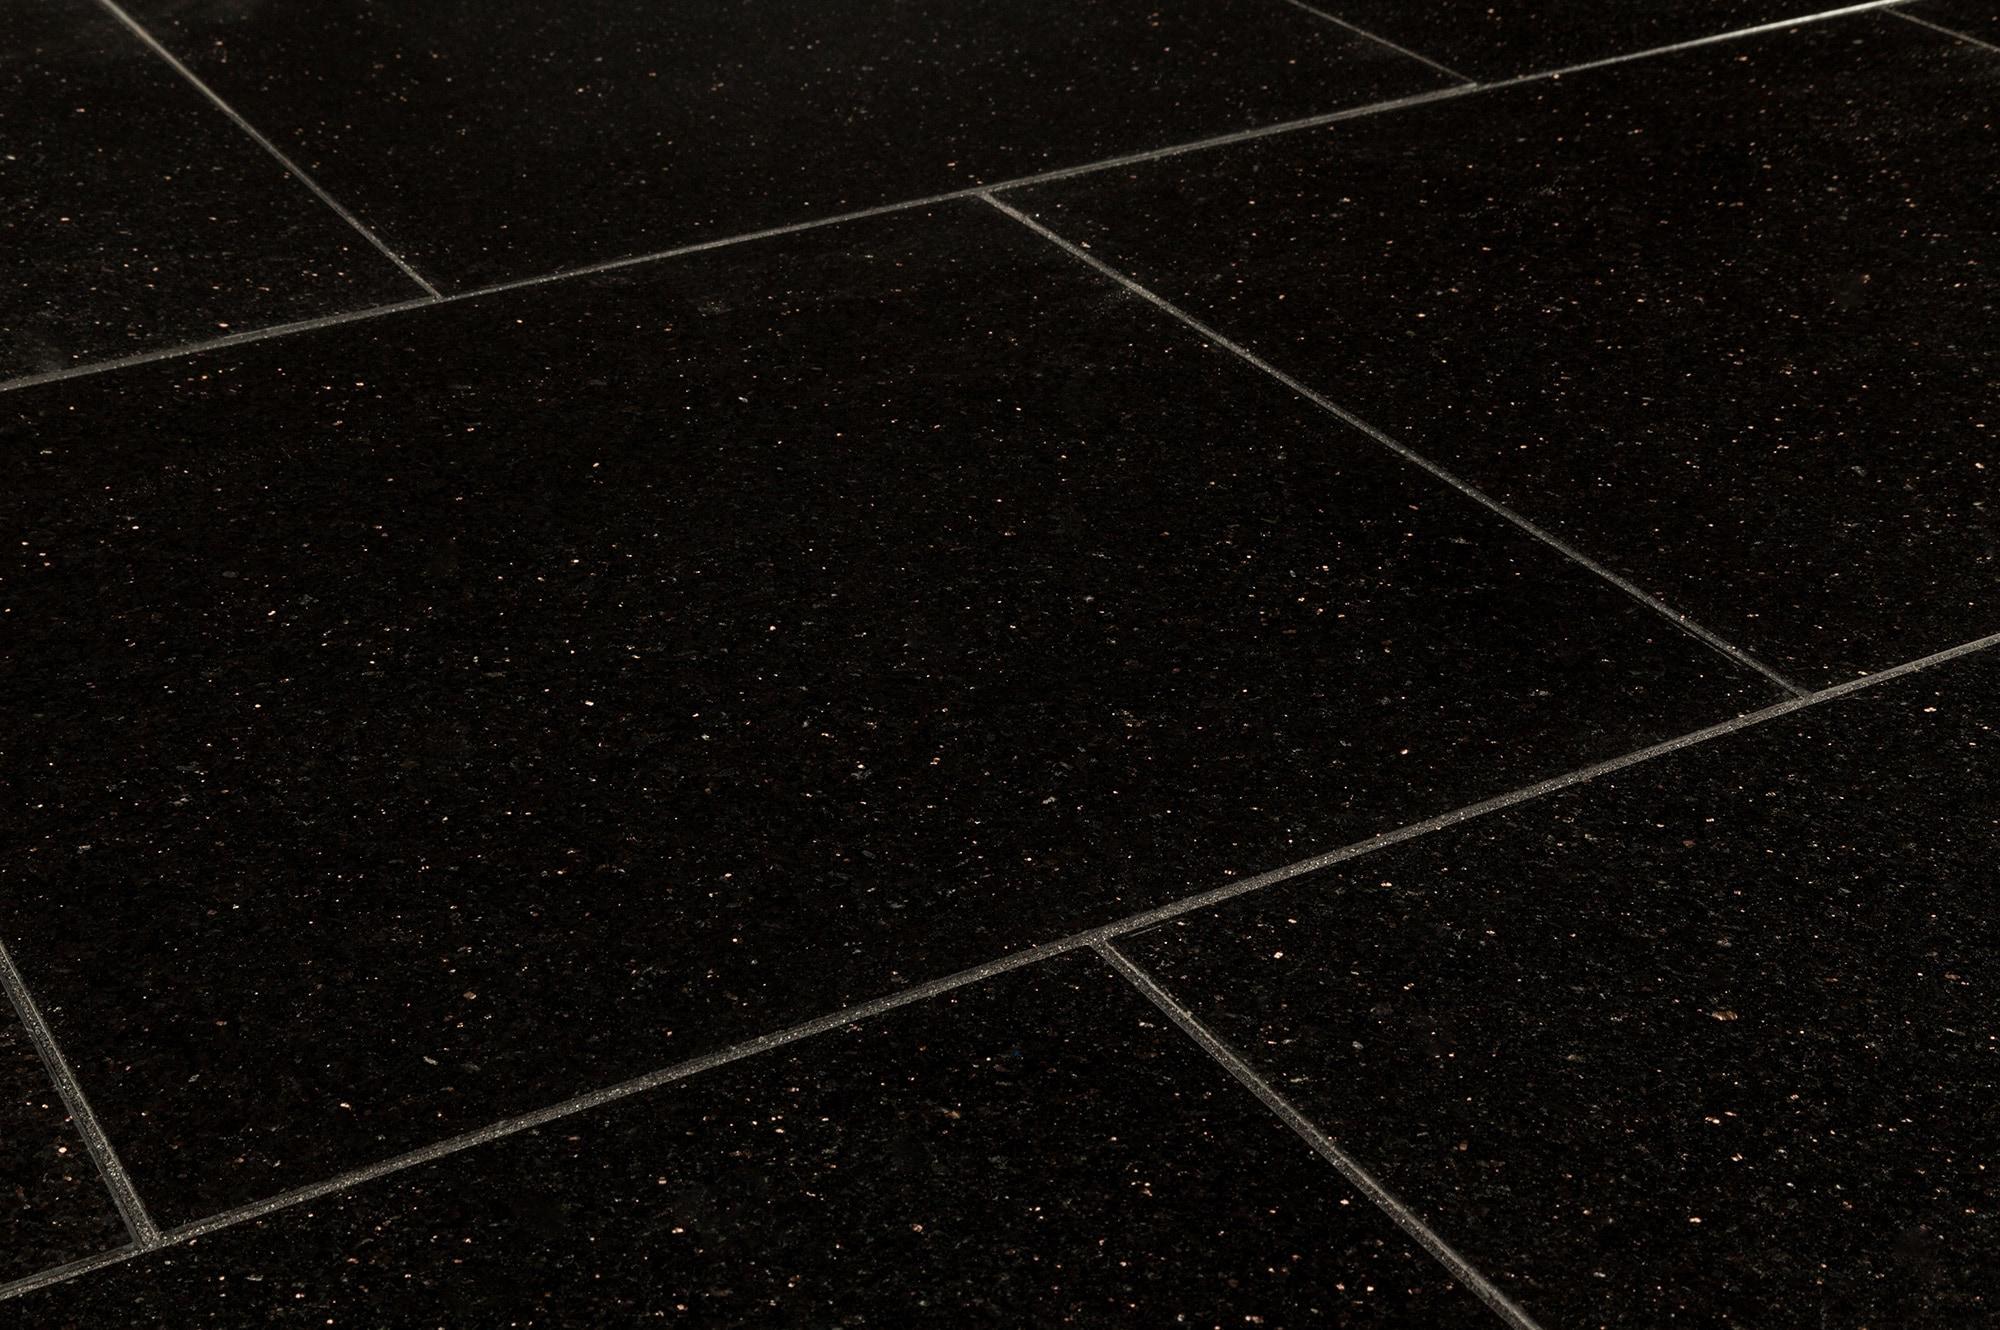 Agra granite tile pallavas collection black galaxy 18x18x12 agra granite tile pallavas collection black galaxy 18x18x12 polished dailygadgetfo Choice Image